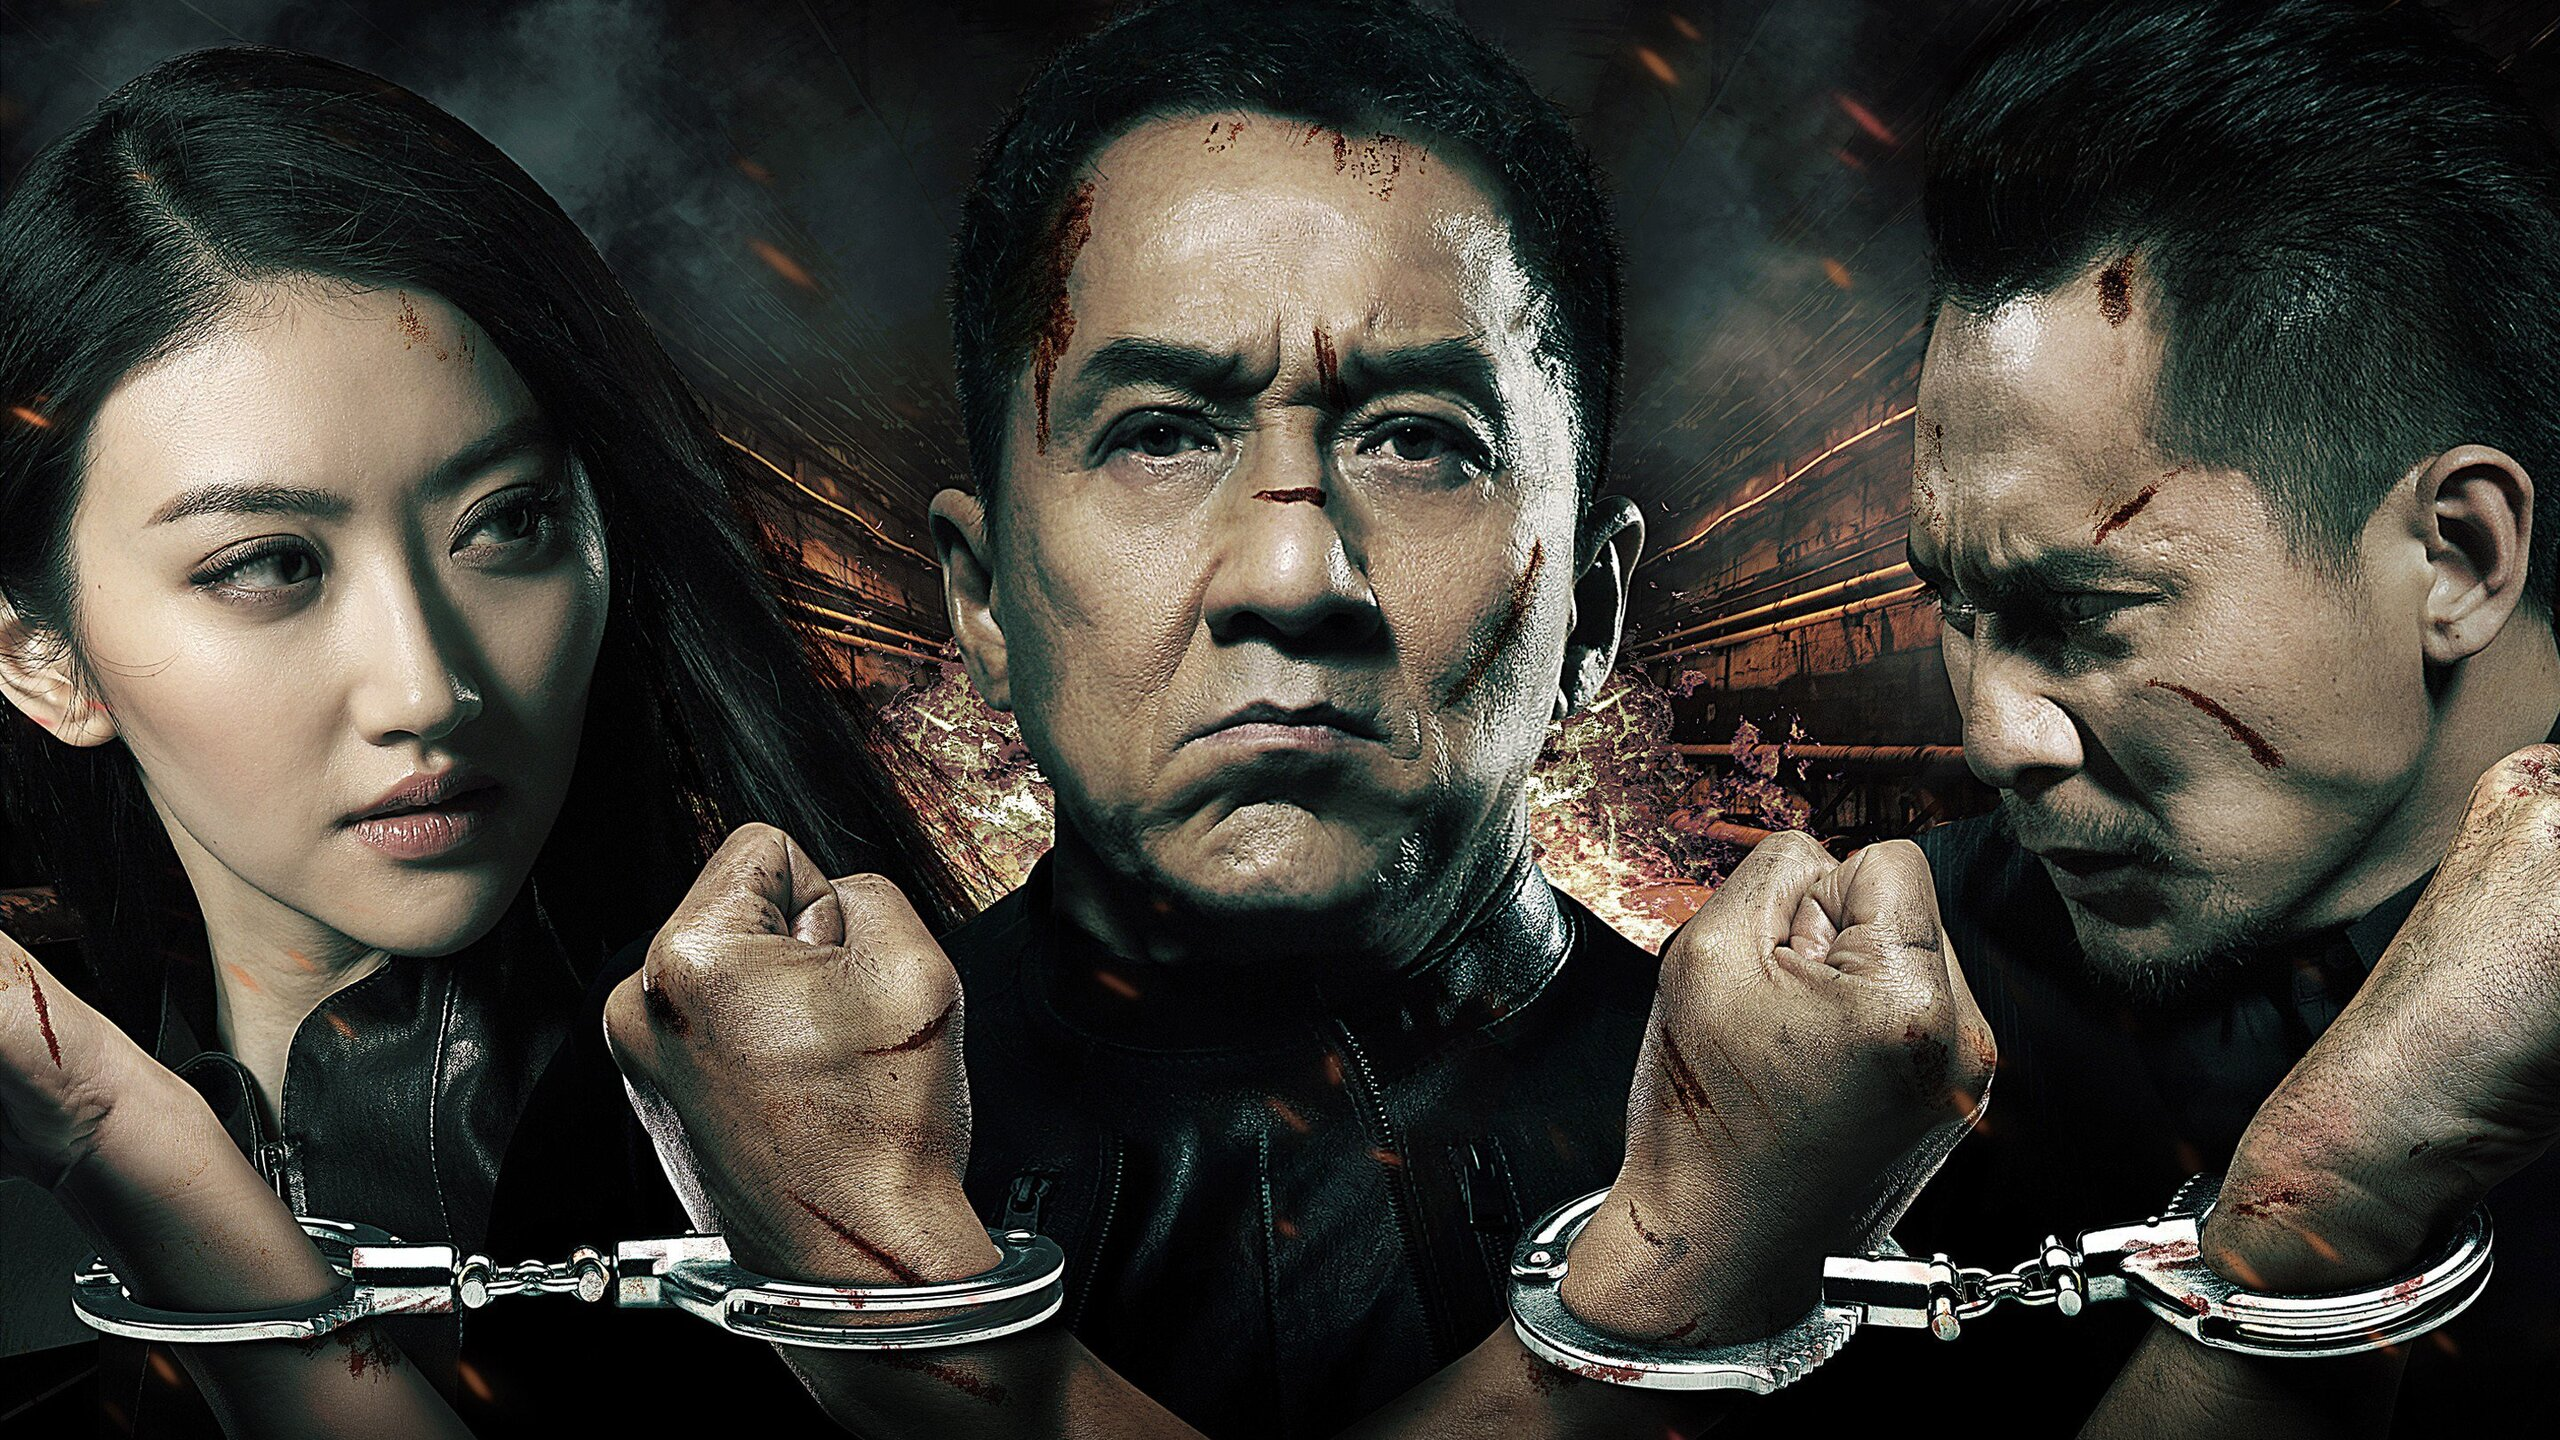 2560x1440 Jackie Chan Police Story 1440p Resolution Hd 4k